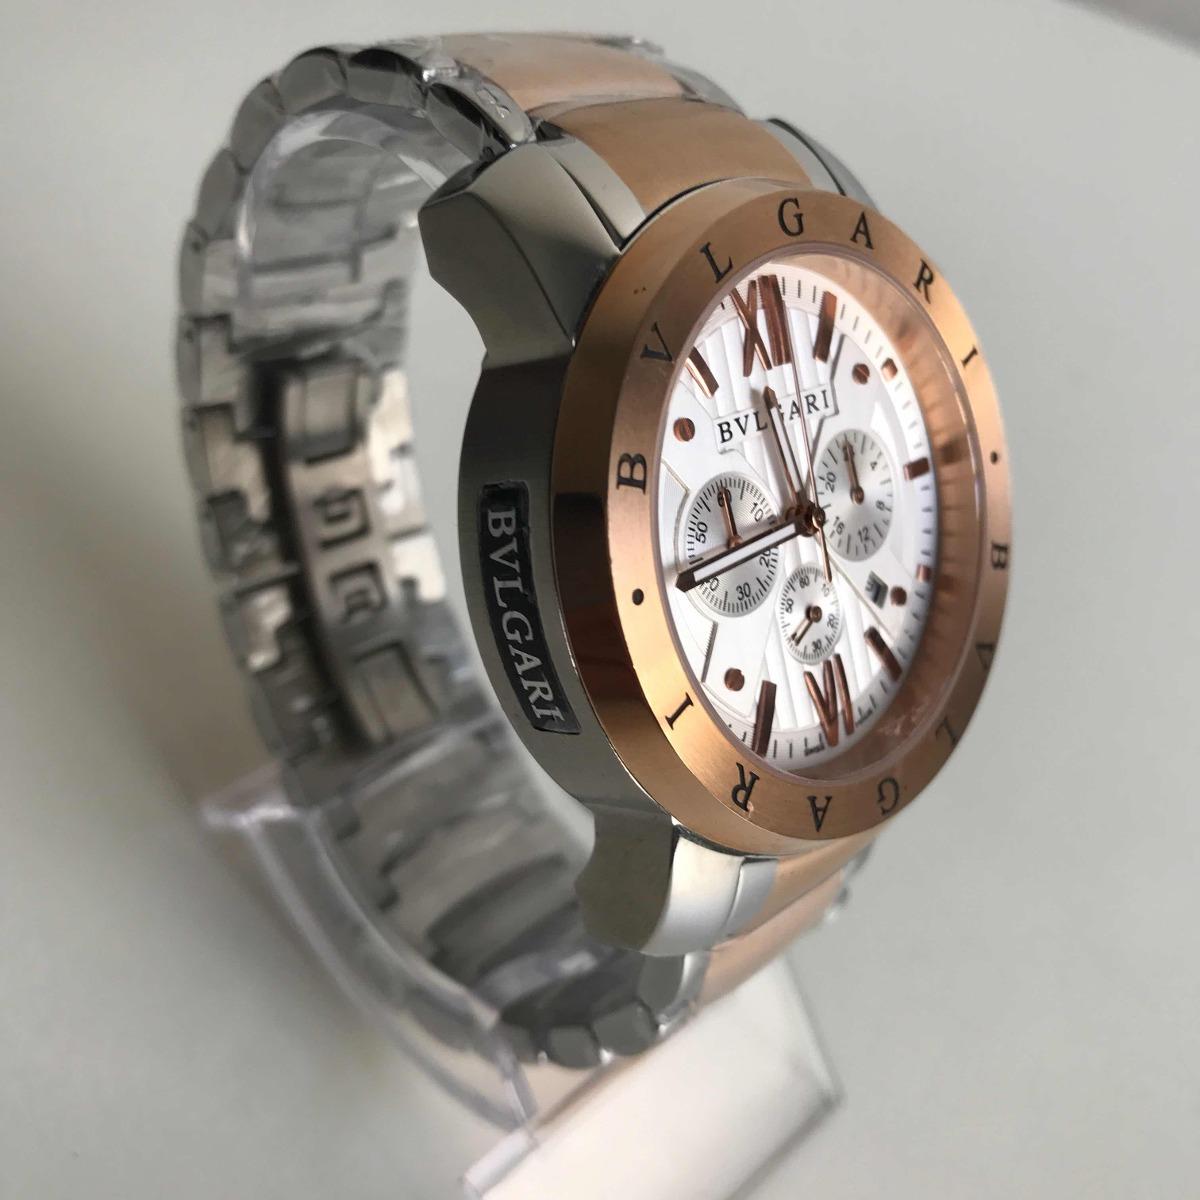 57887a276f2 relógio bvlgari iron man prata rose fundo branco. Carregando zoom.